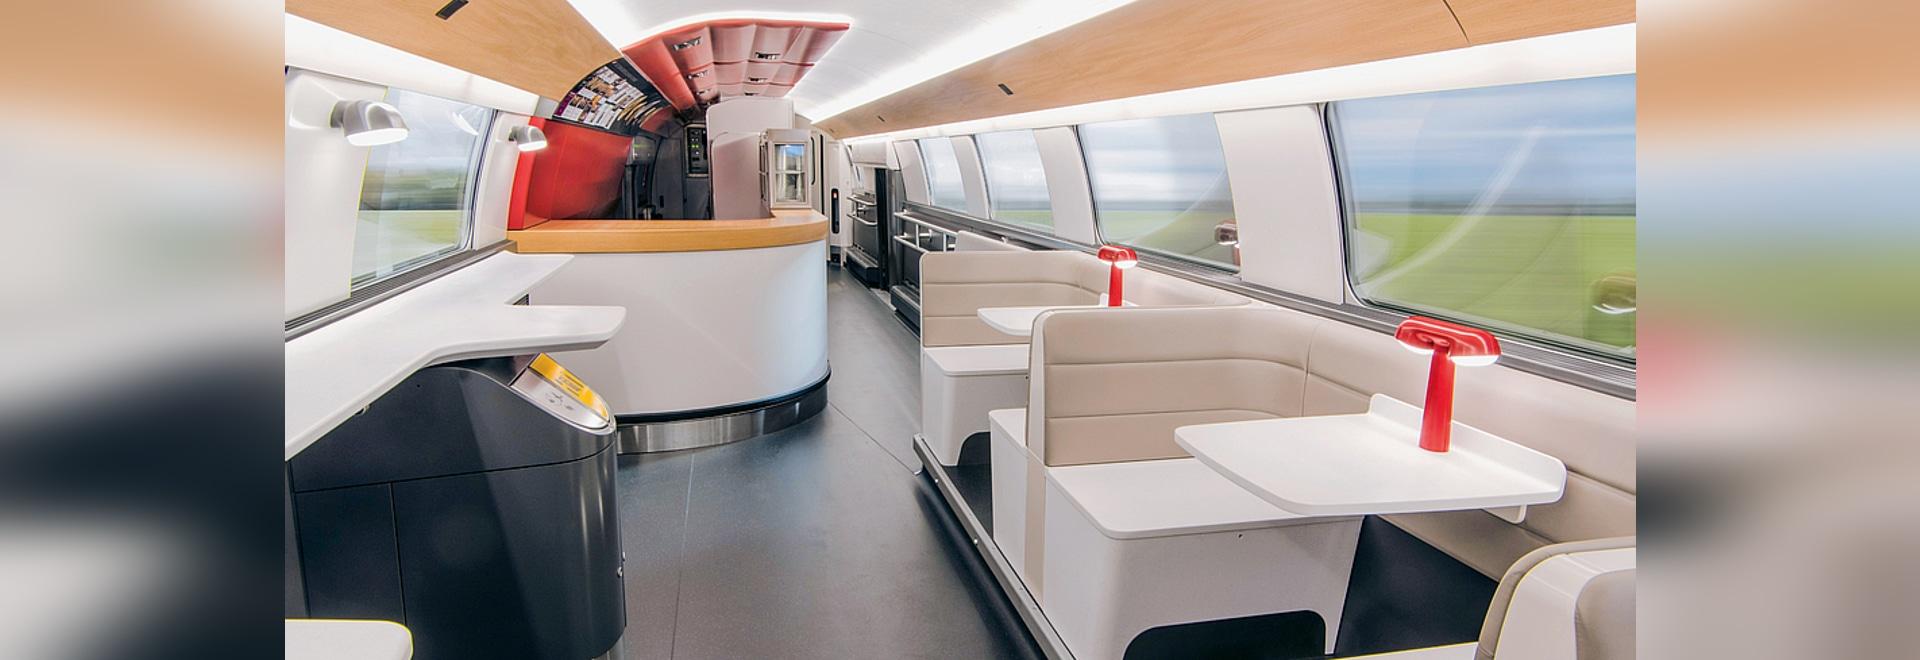 SNCF I TGV L'Océane